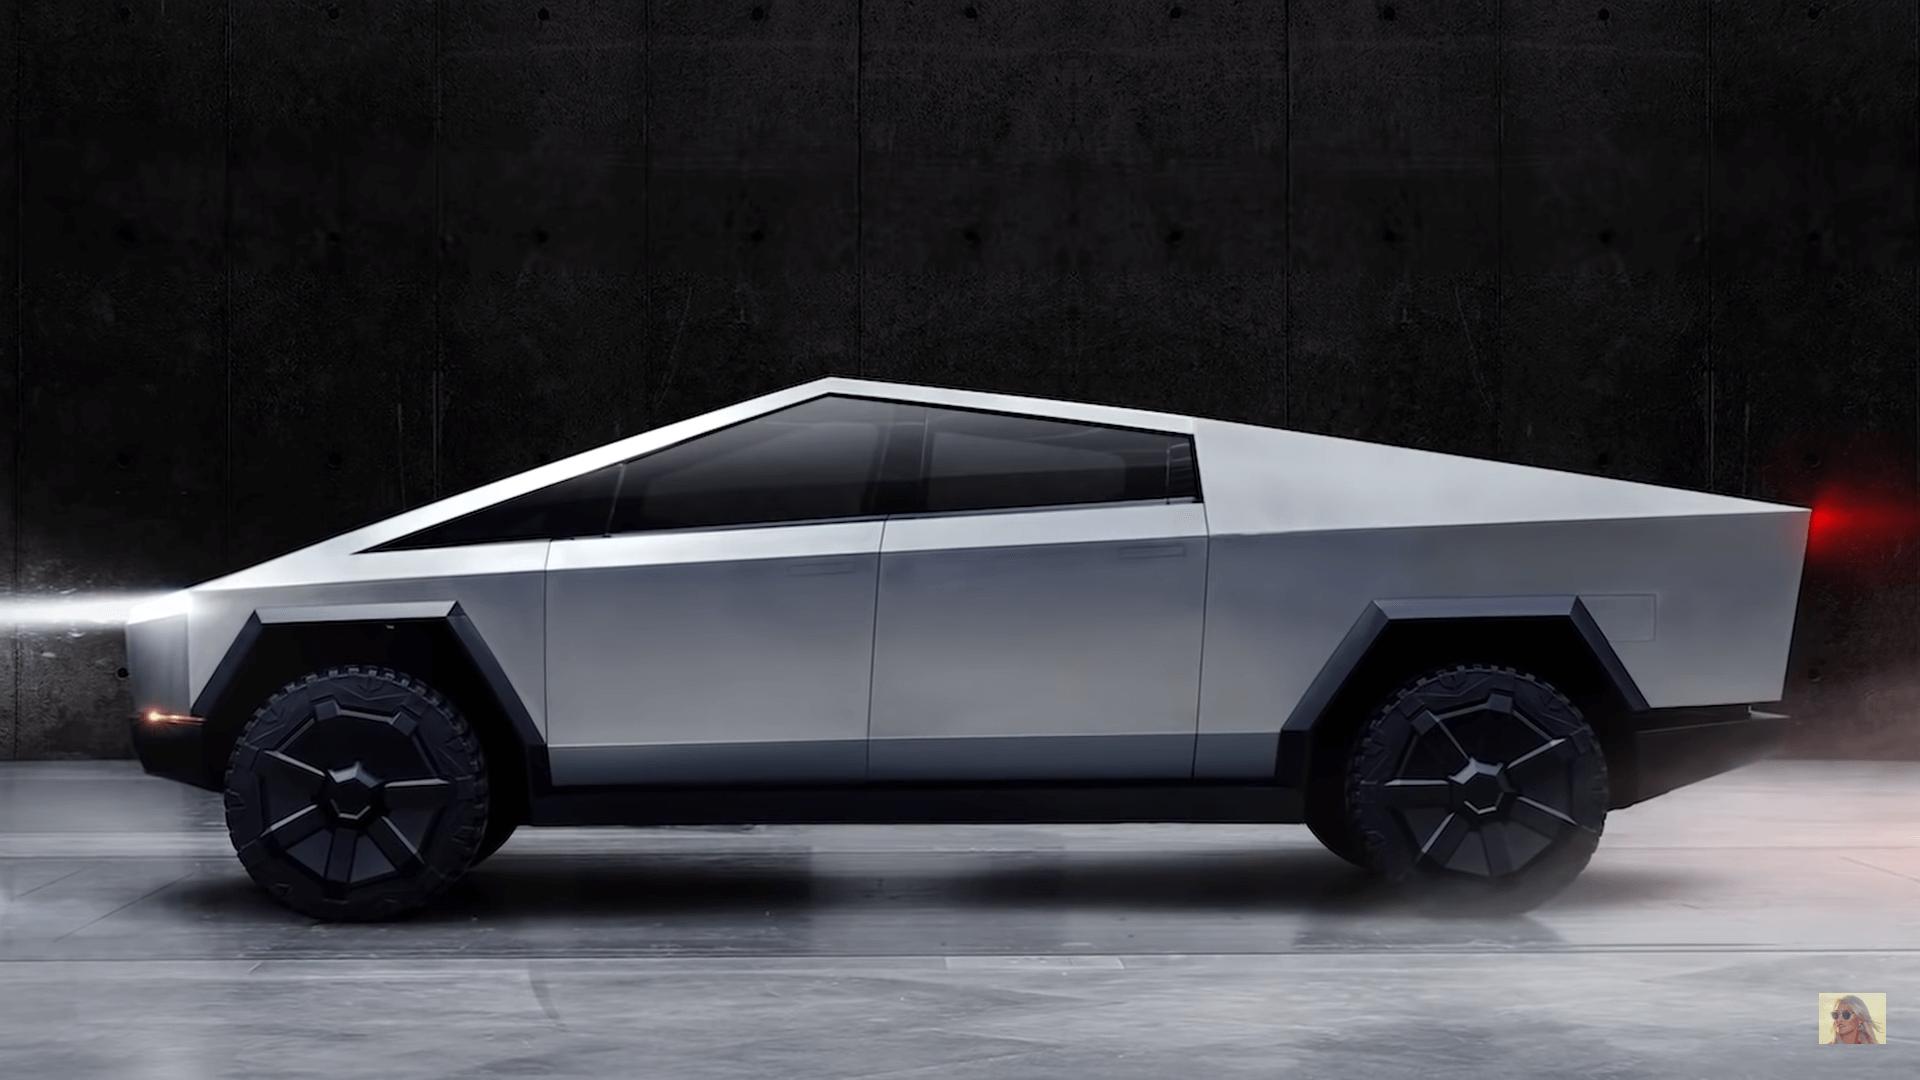 Matchless-James-Bond-Inspired-Design